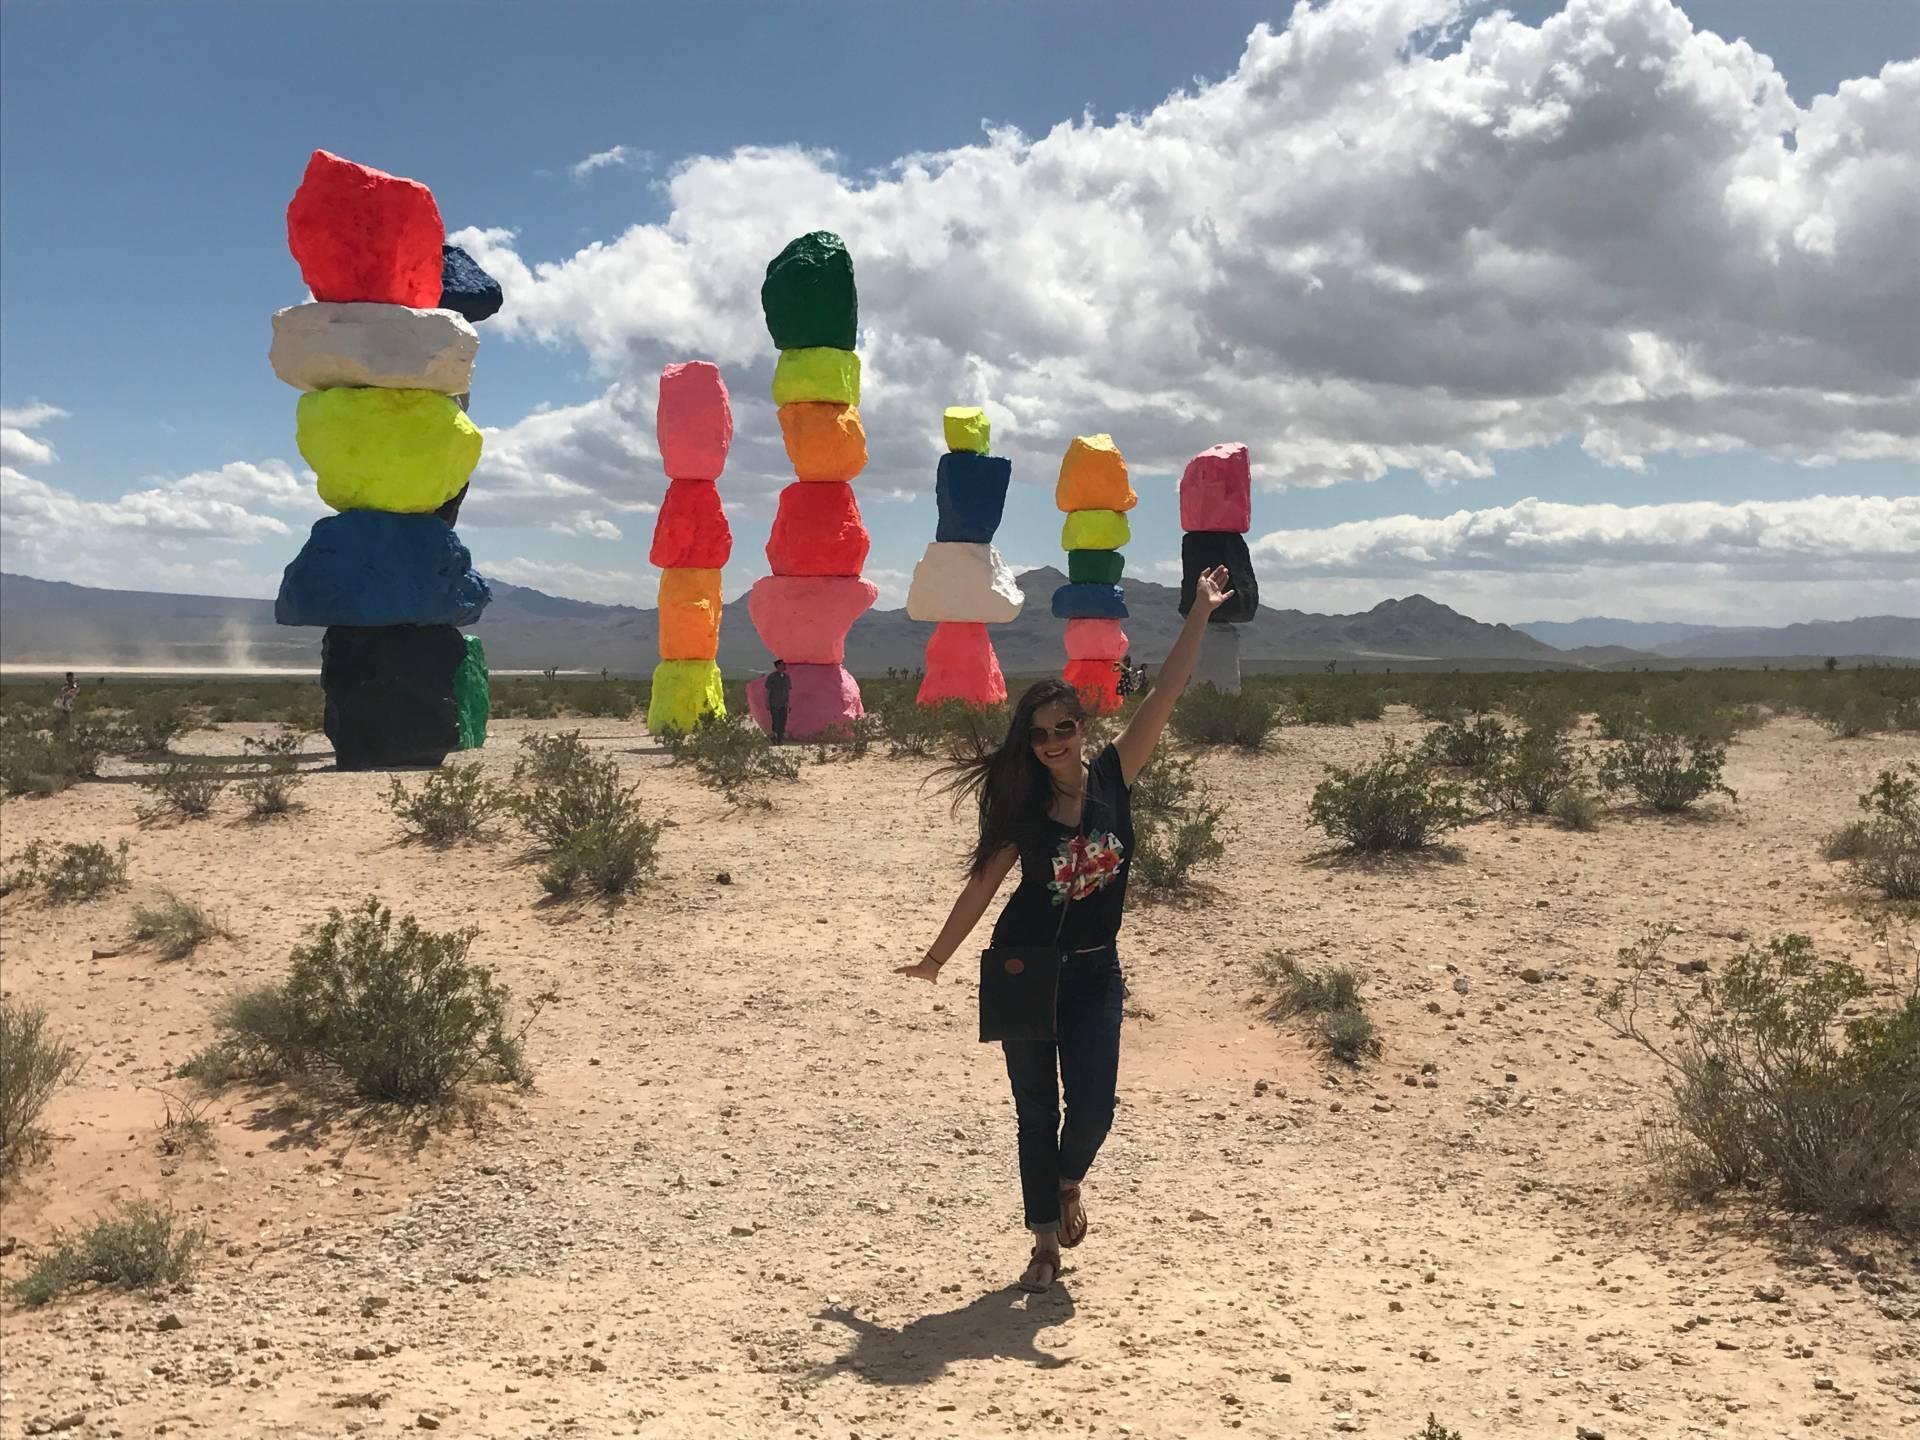 Art installation known as Seven Magic Mountains